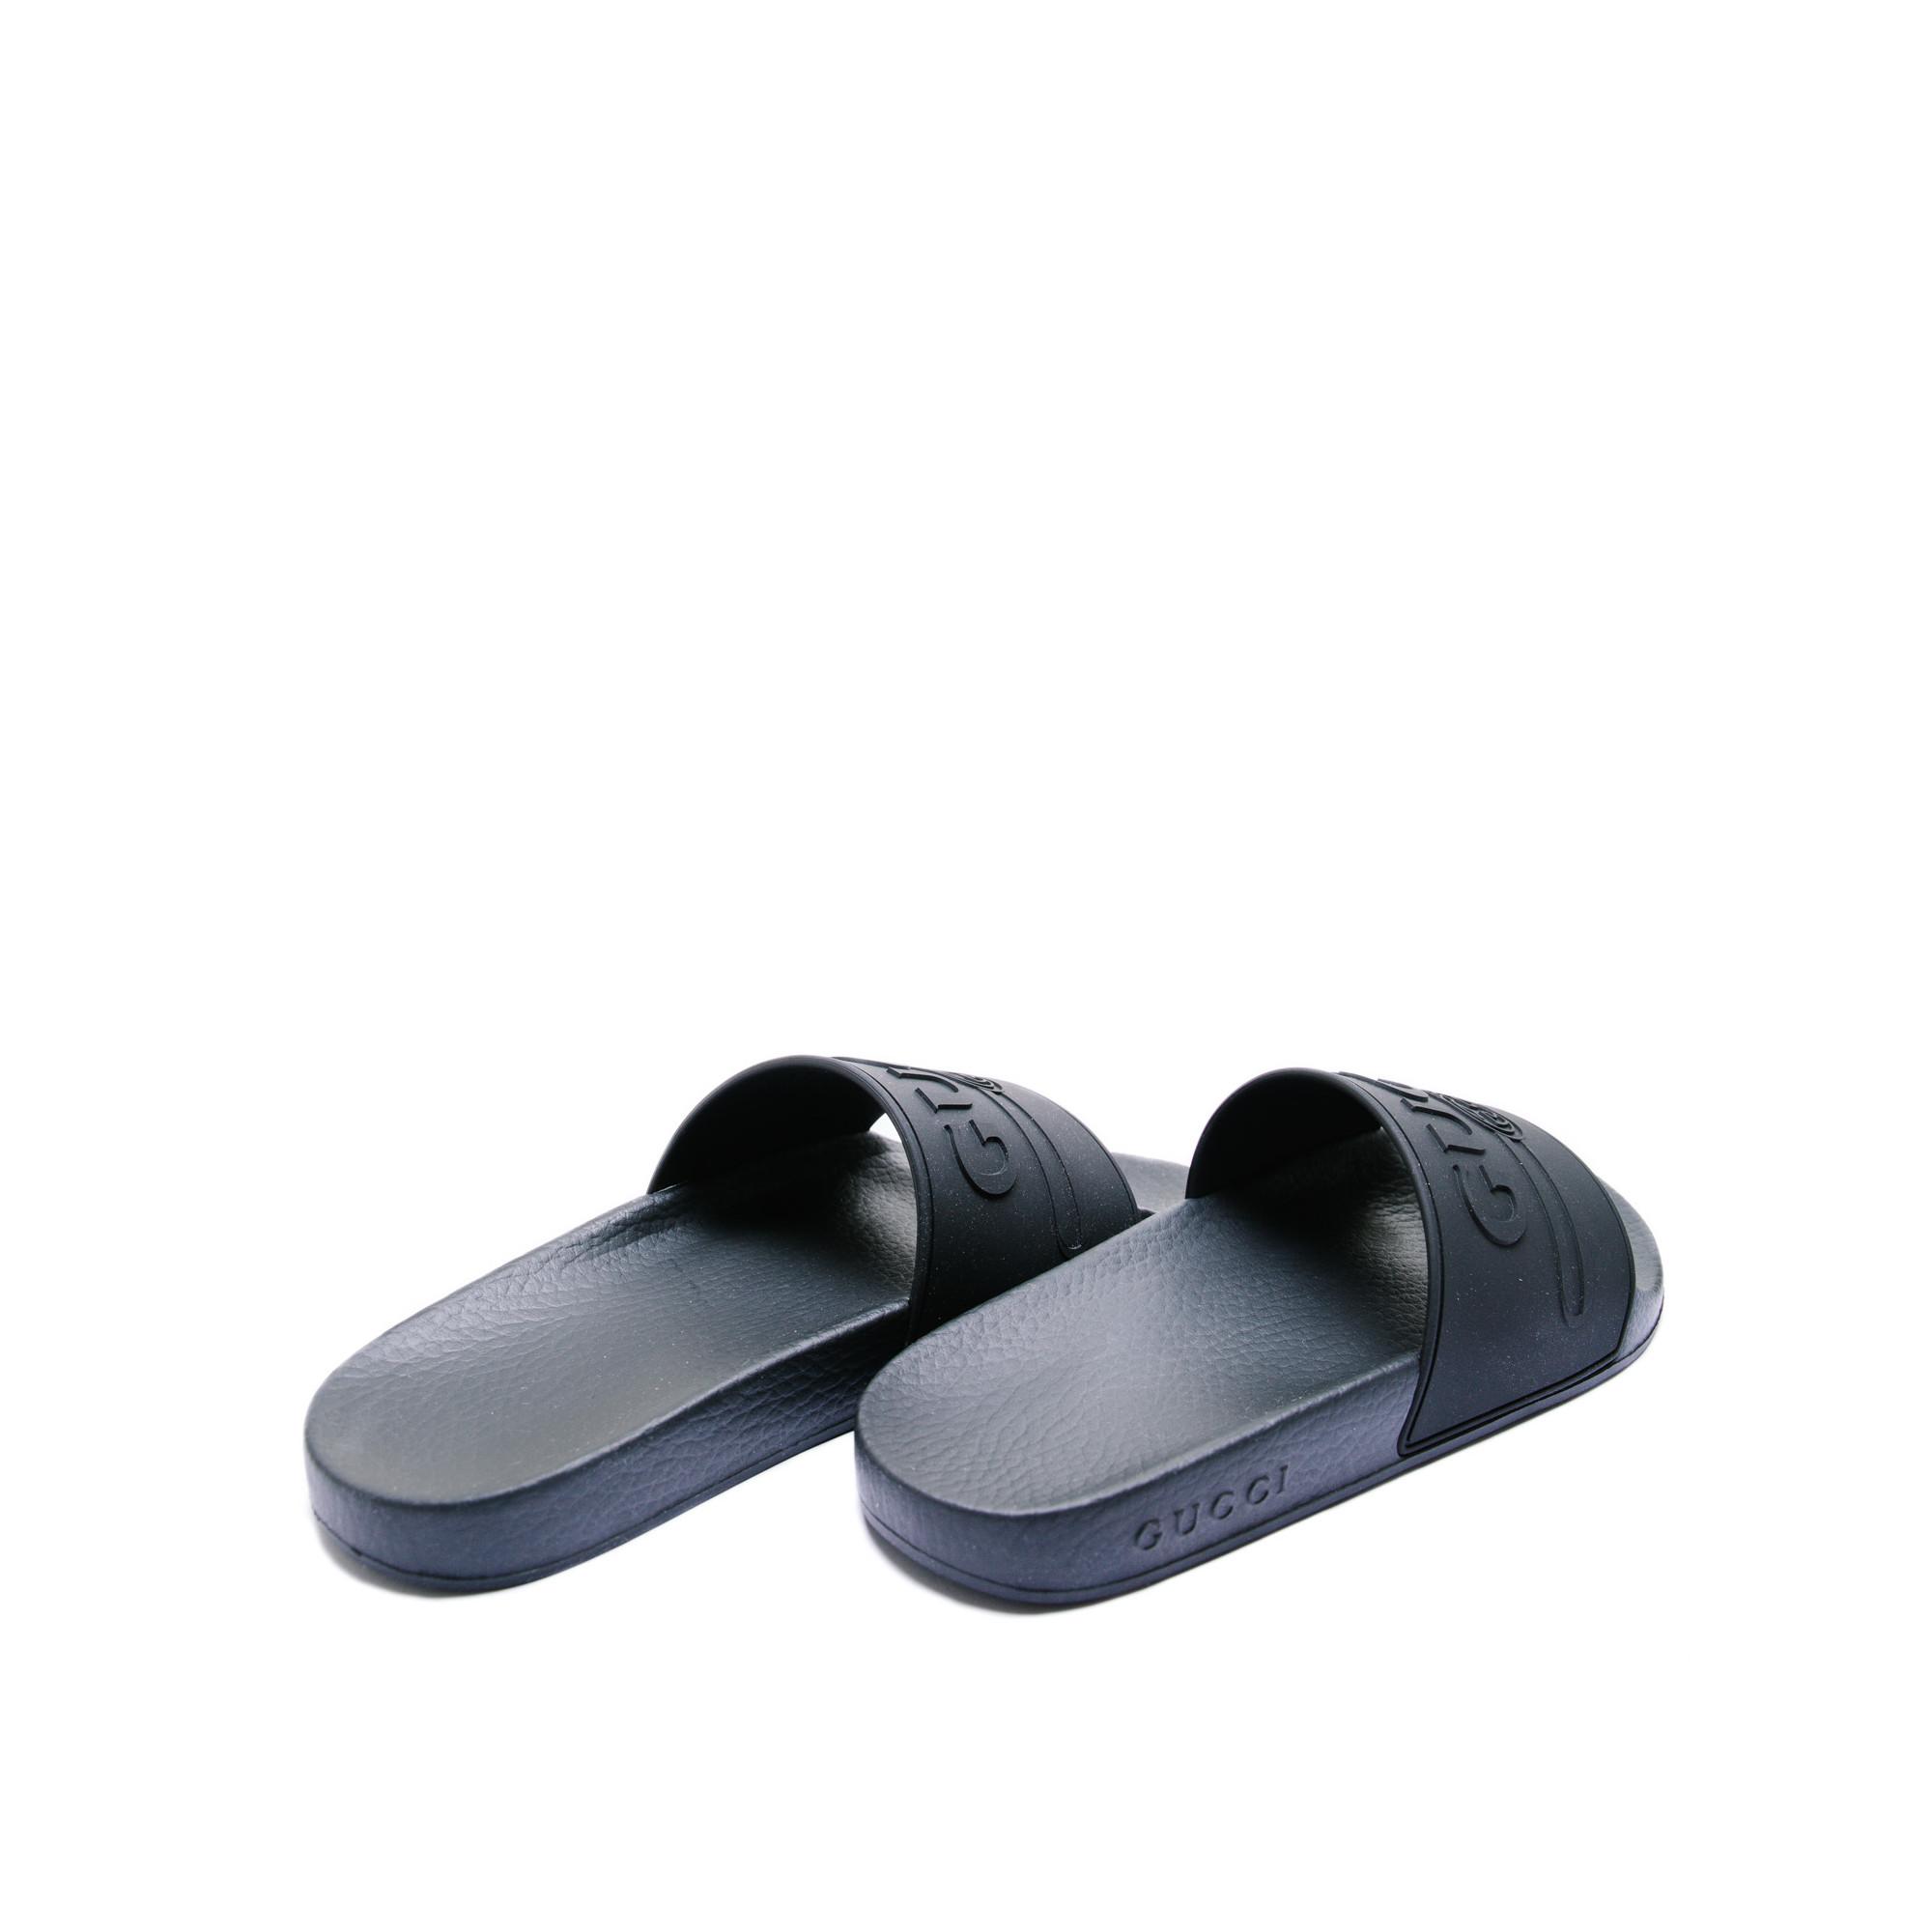 e1baac1a353b22 ... Gucci logo rubber slide sandal black Gucci logo rubber slide sandal  black - www.derodeloper ...